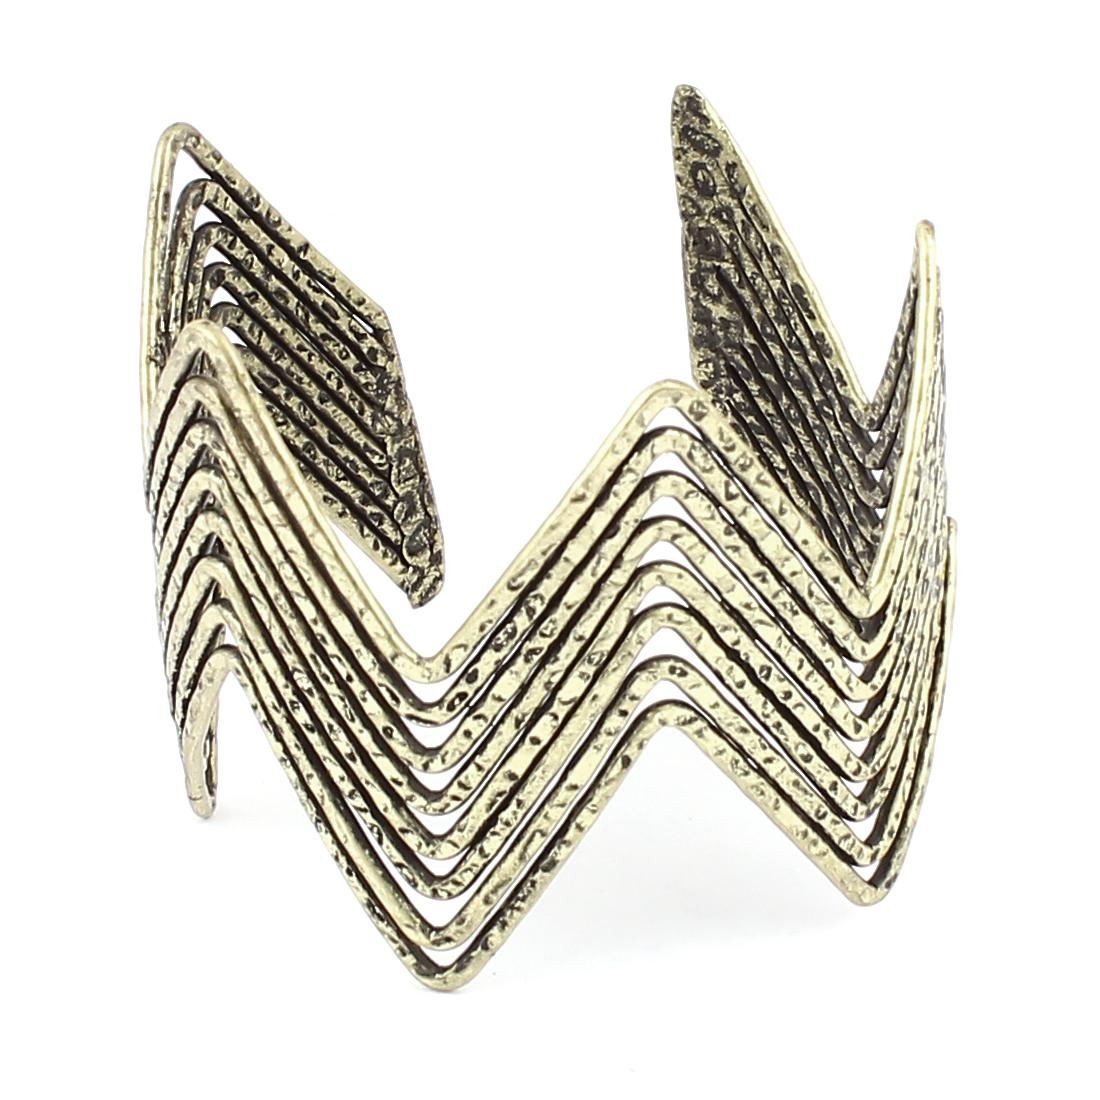 "Unisex 2.2"" Dia Bronze Tone Metal Half Open Style Wrist Decoration Bracelet Bangle for Lady Women Men"